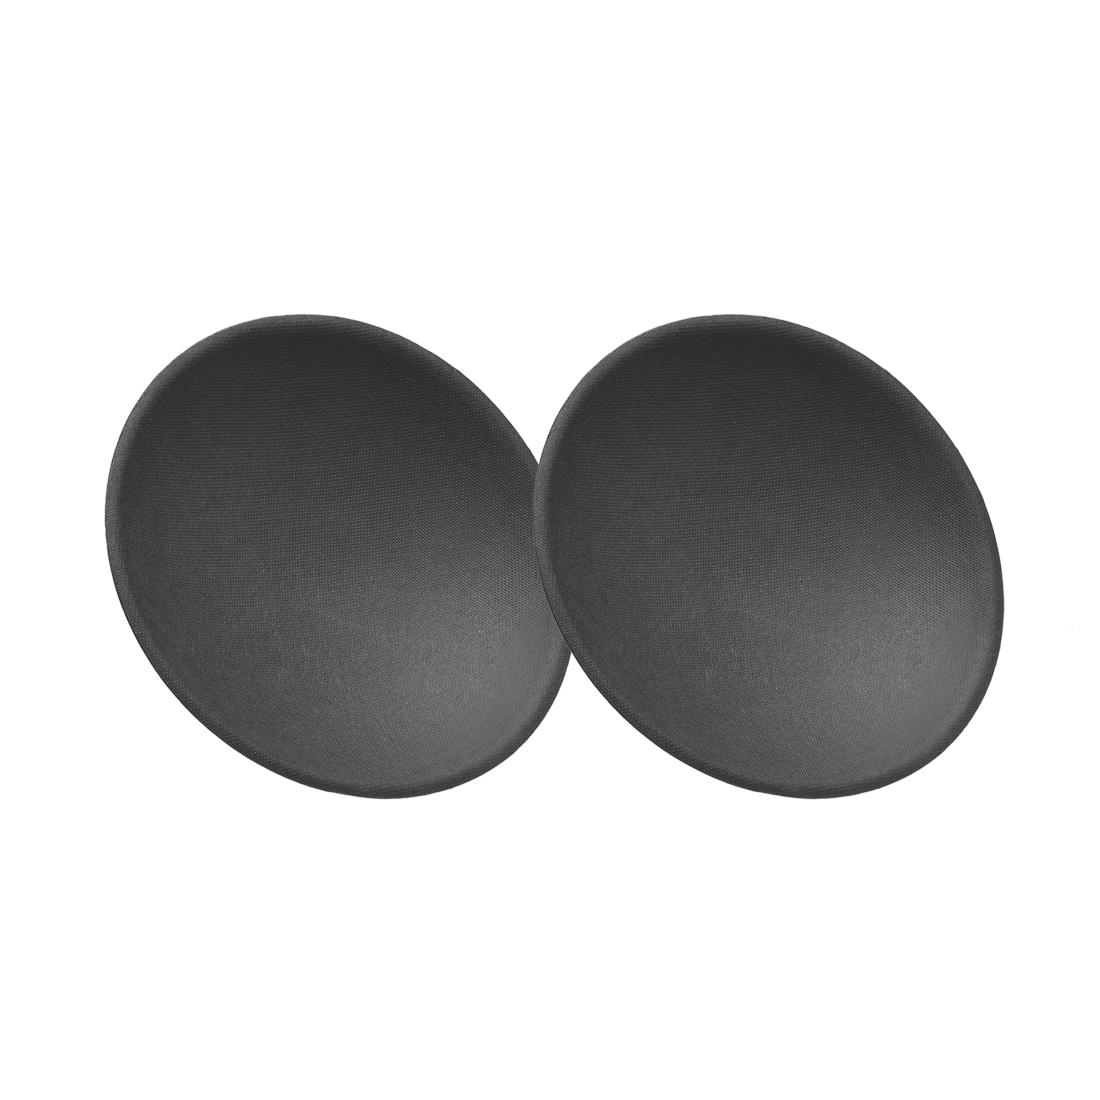 "Speaker Dust Cap 115mm/4.5"" Diameter Subwoofer Paper Dome Coil Cover Caps 2 Pcs"